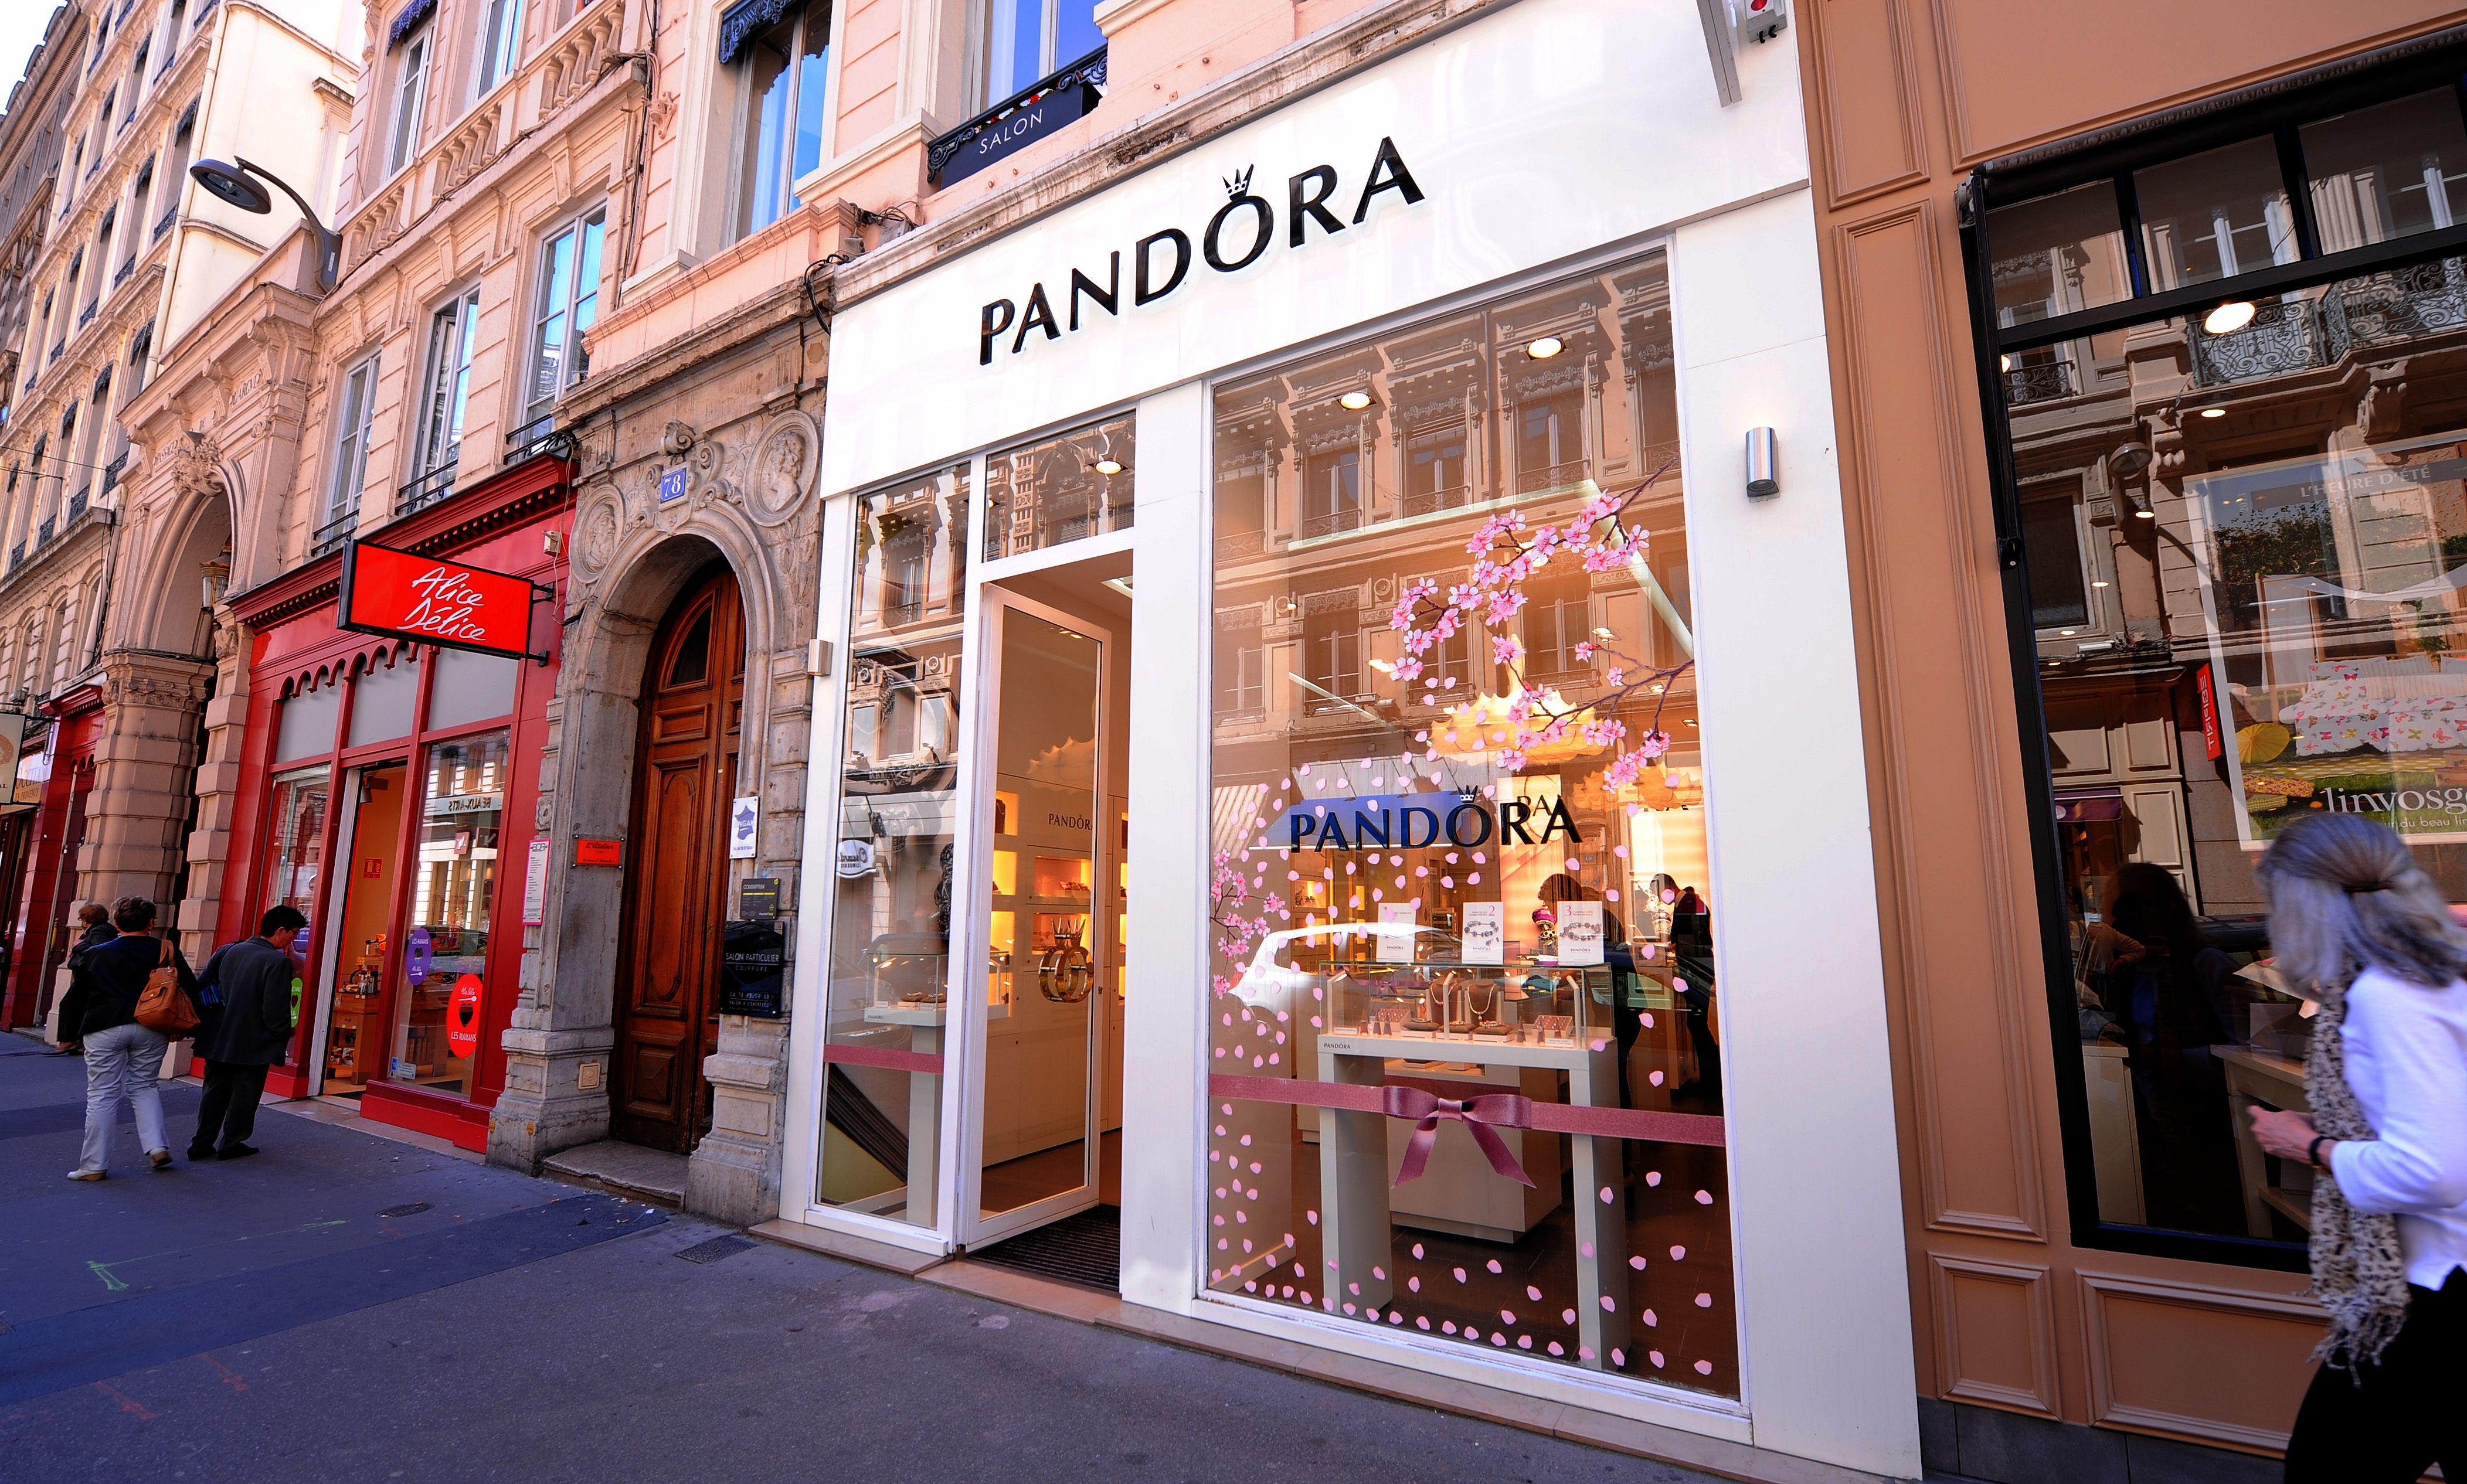 Pandora store à Lyon | Street view, Street, Pandora